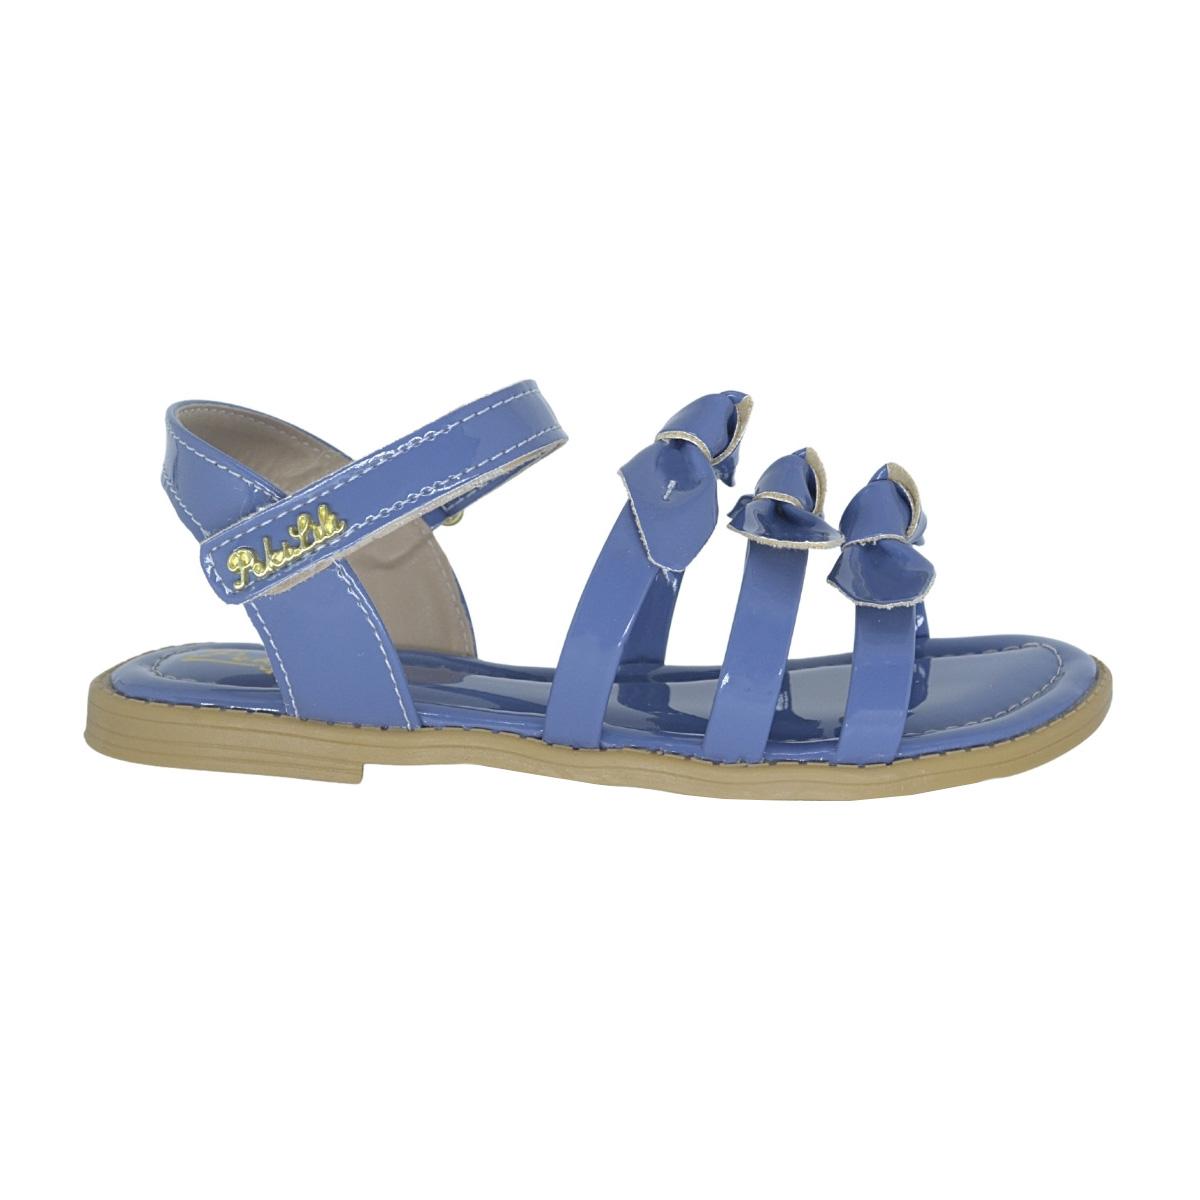 Sandalia Infantil três laços azul